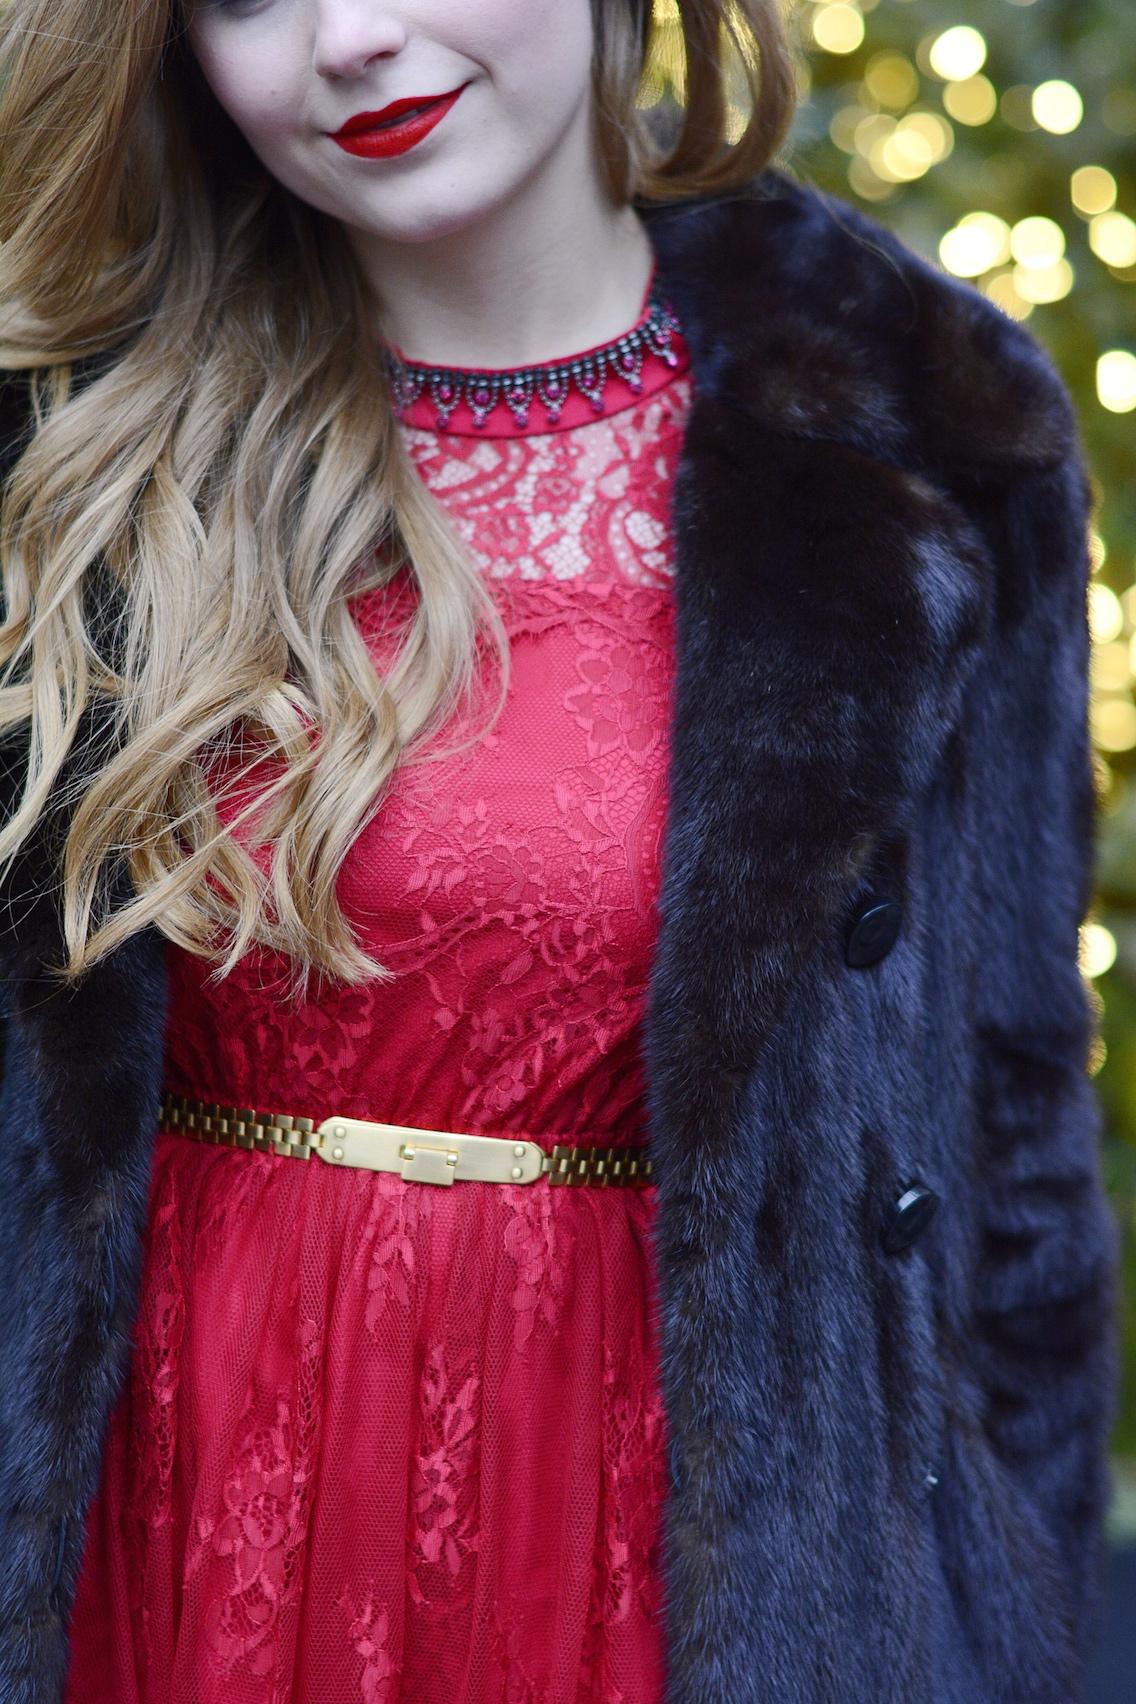 Chicwish Lace Dress LK Bennett Sledge Pumps 4